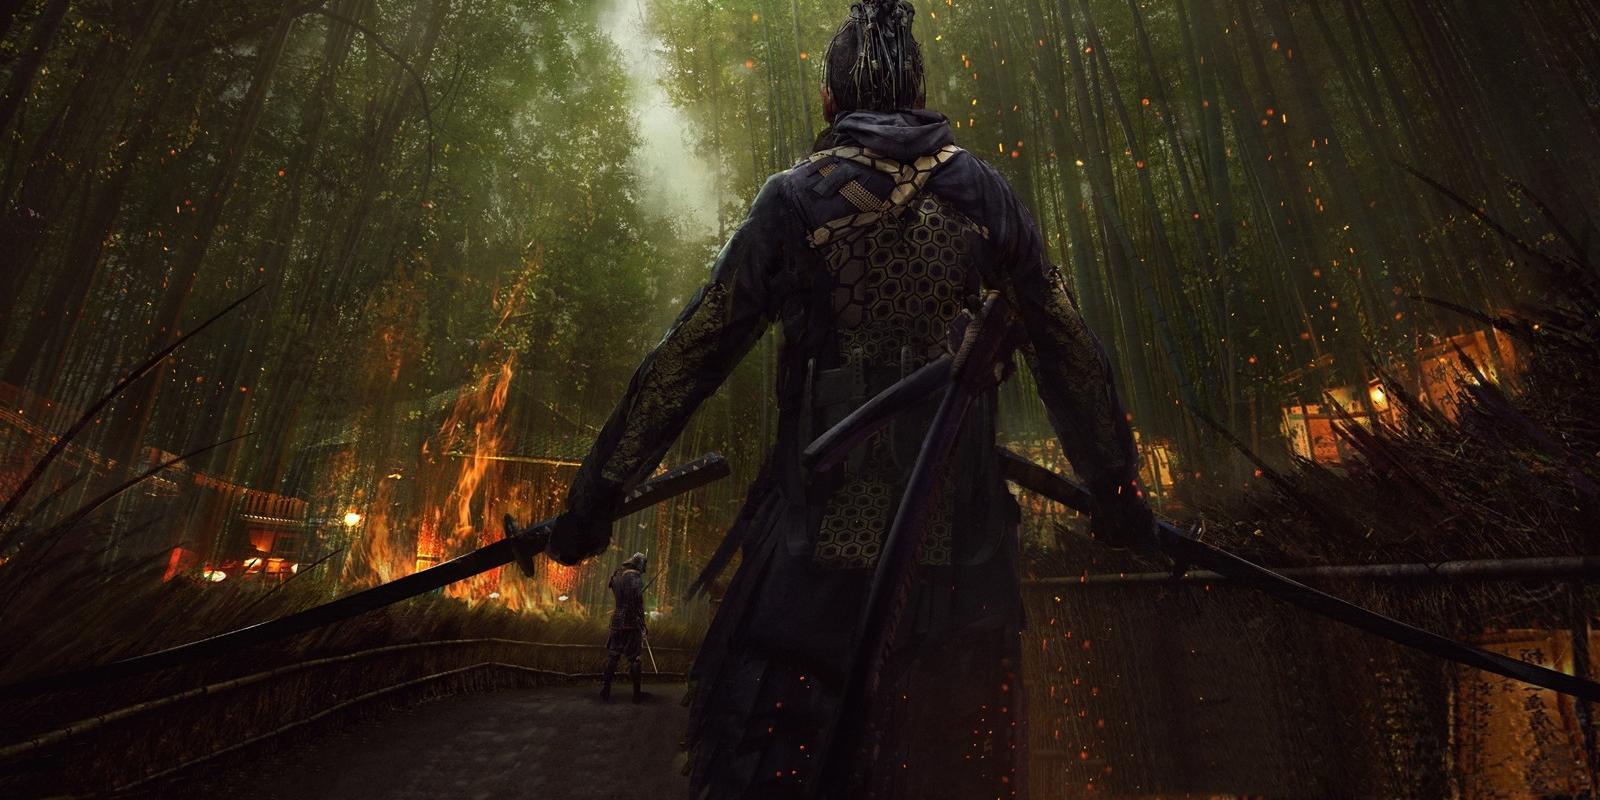 General 1600x800 artwork concept art samurai Japan fire e-mendoza sword katana back bamboo dreadlocks Eddie Mendoza